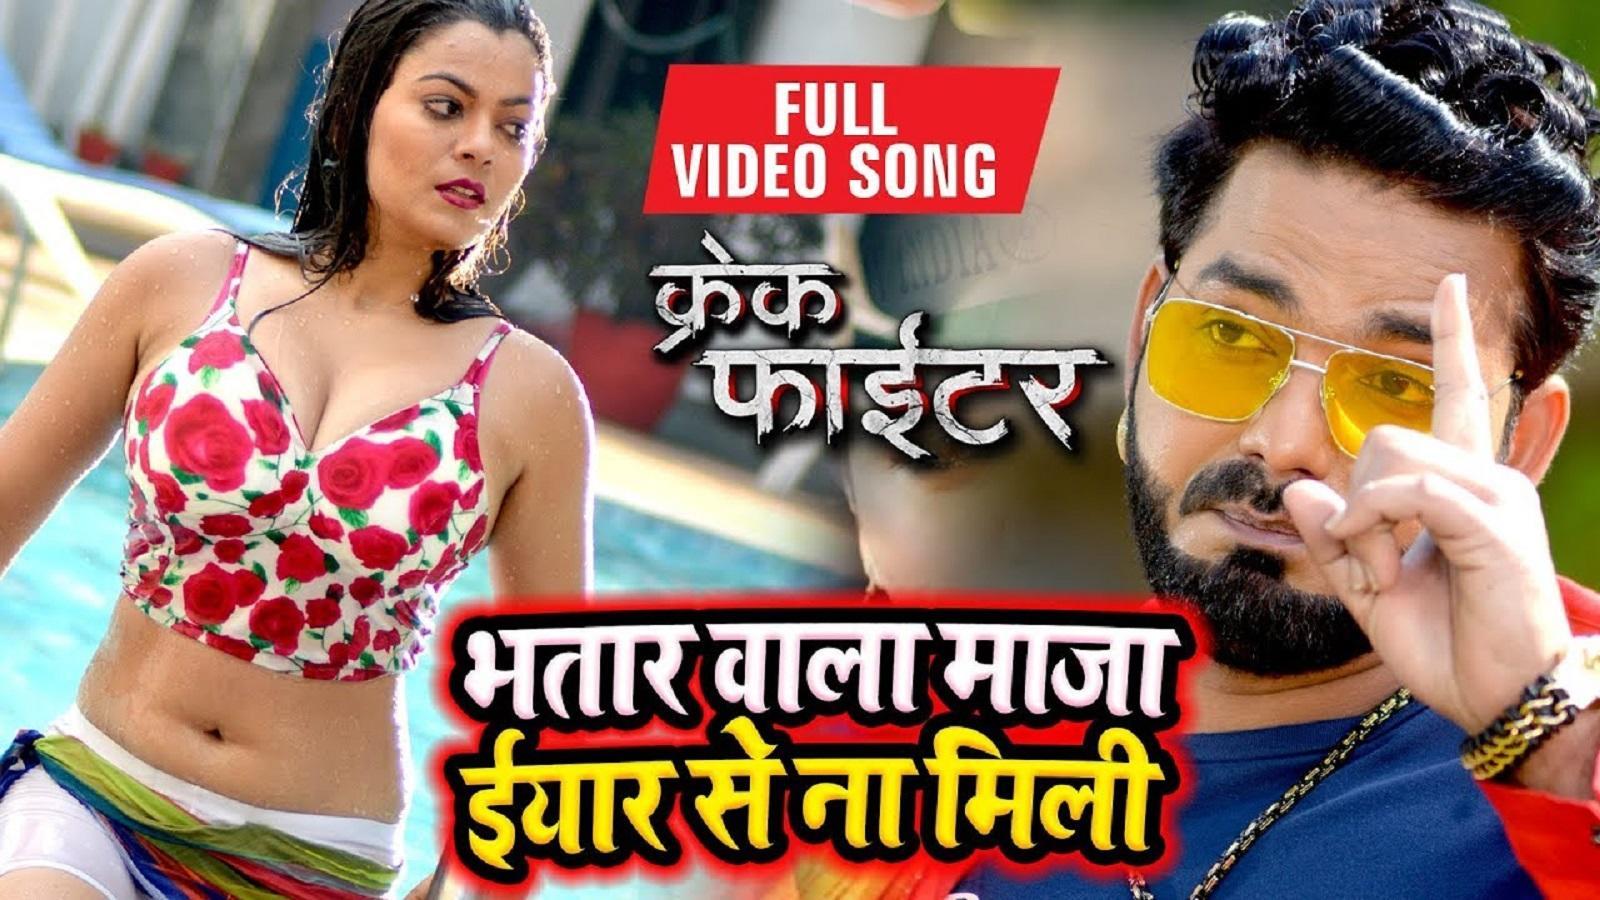 Fighter song crack movie full Bhojpuri movie